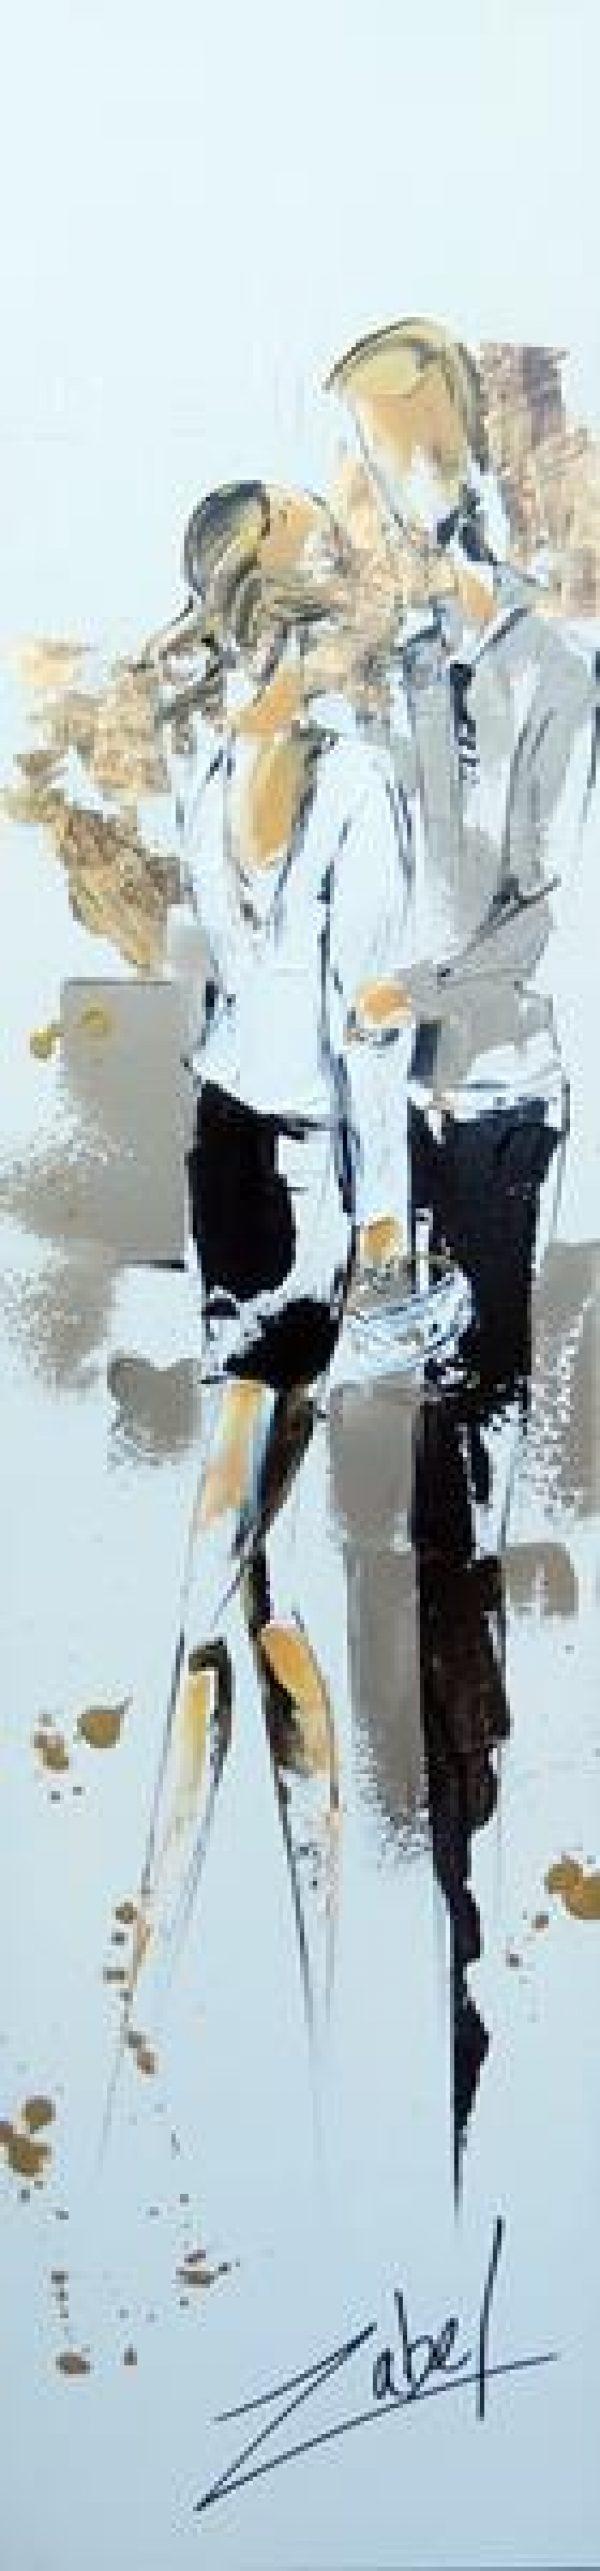 Zabel - Fashion & Style - 12x48_web